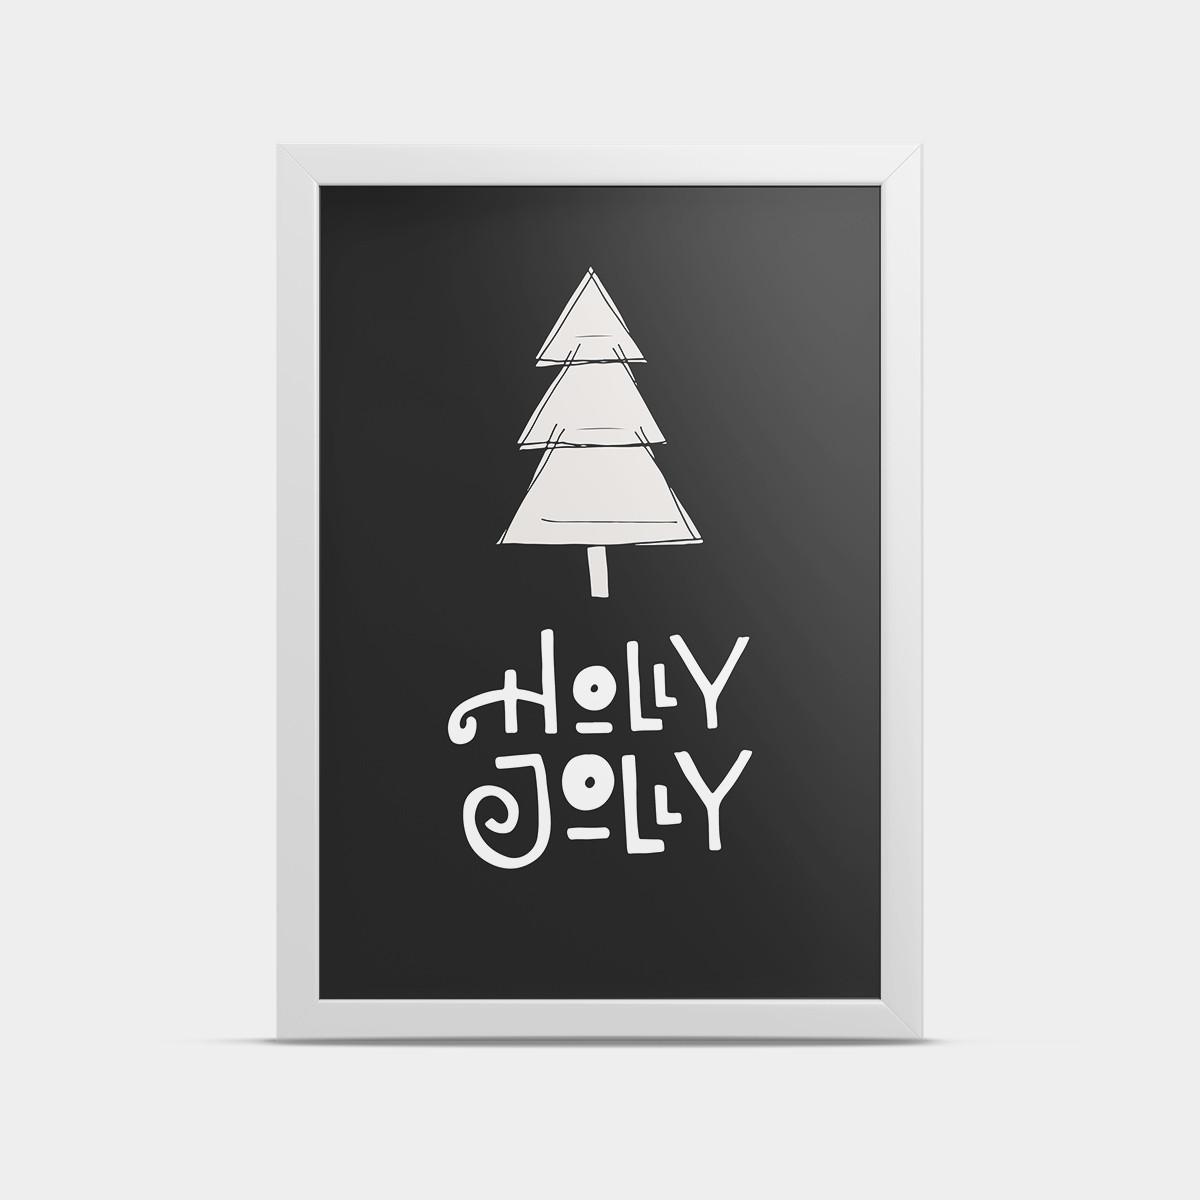 Постер Holly Golly 20*30 см